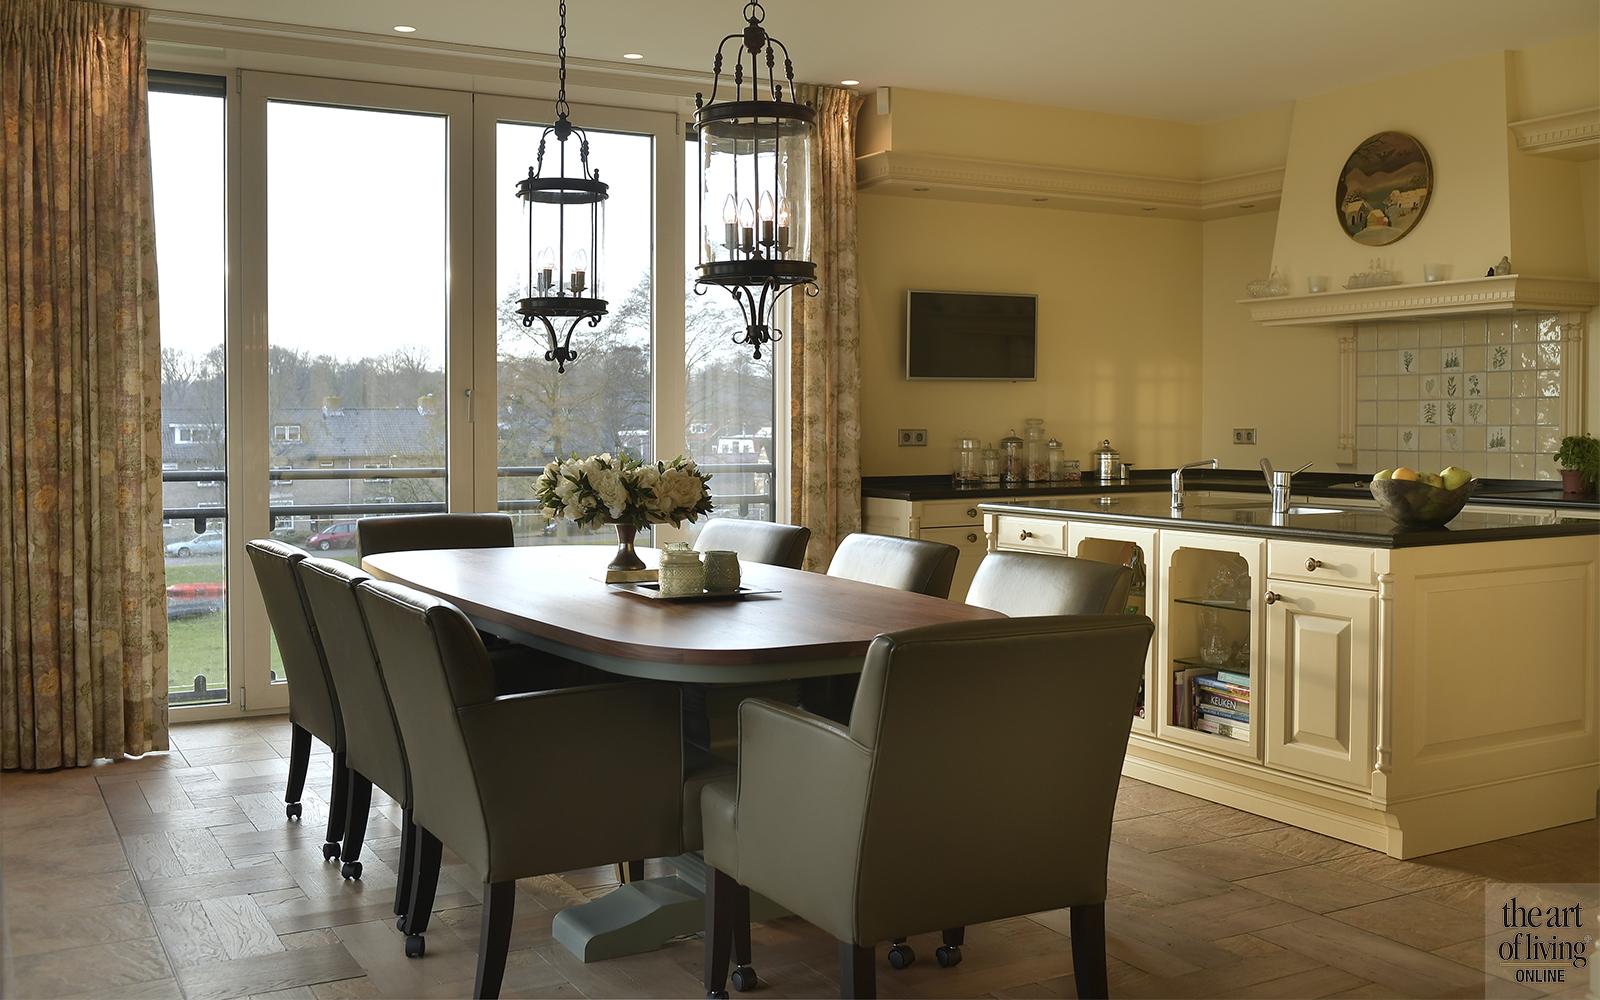 Klassiek interieur, DE JUUL Interieurarchitectuur, Penthouse, klassieke stijl, kroonluchter, Afrikaanse stijl, Interieurdesign